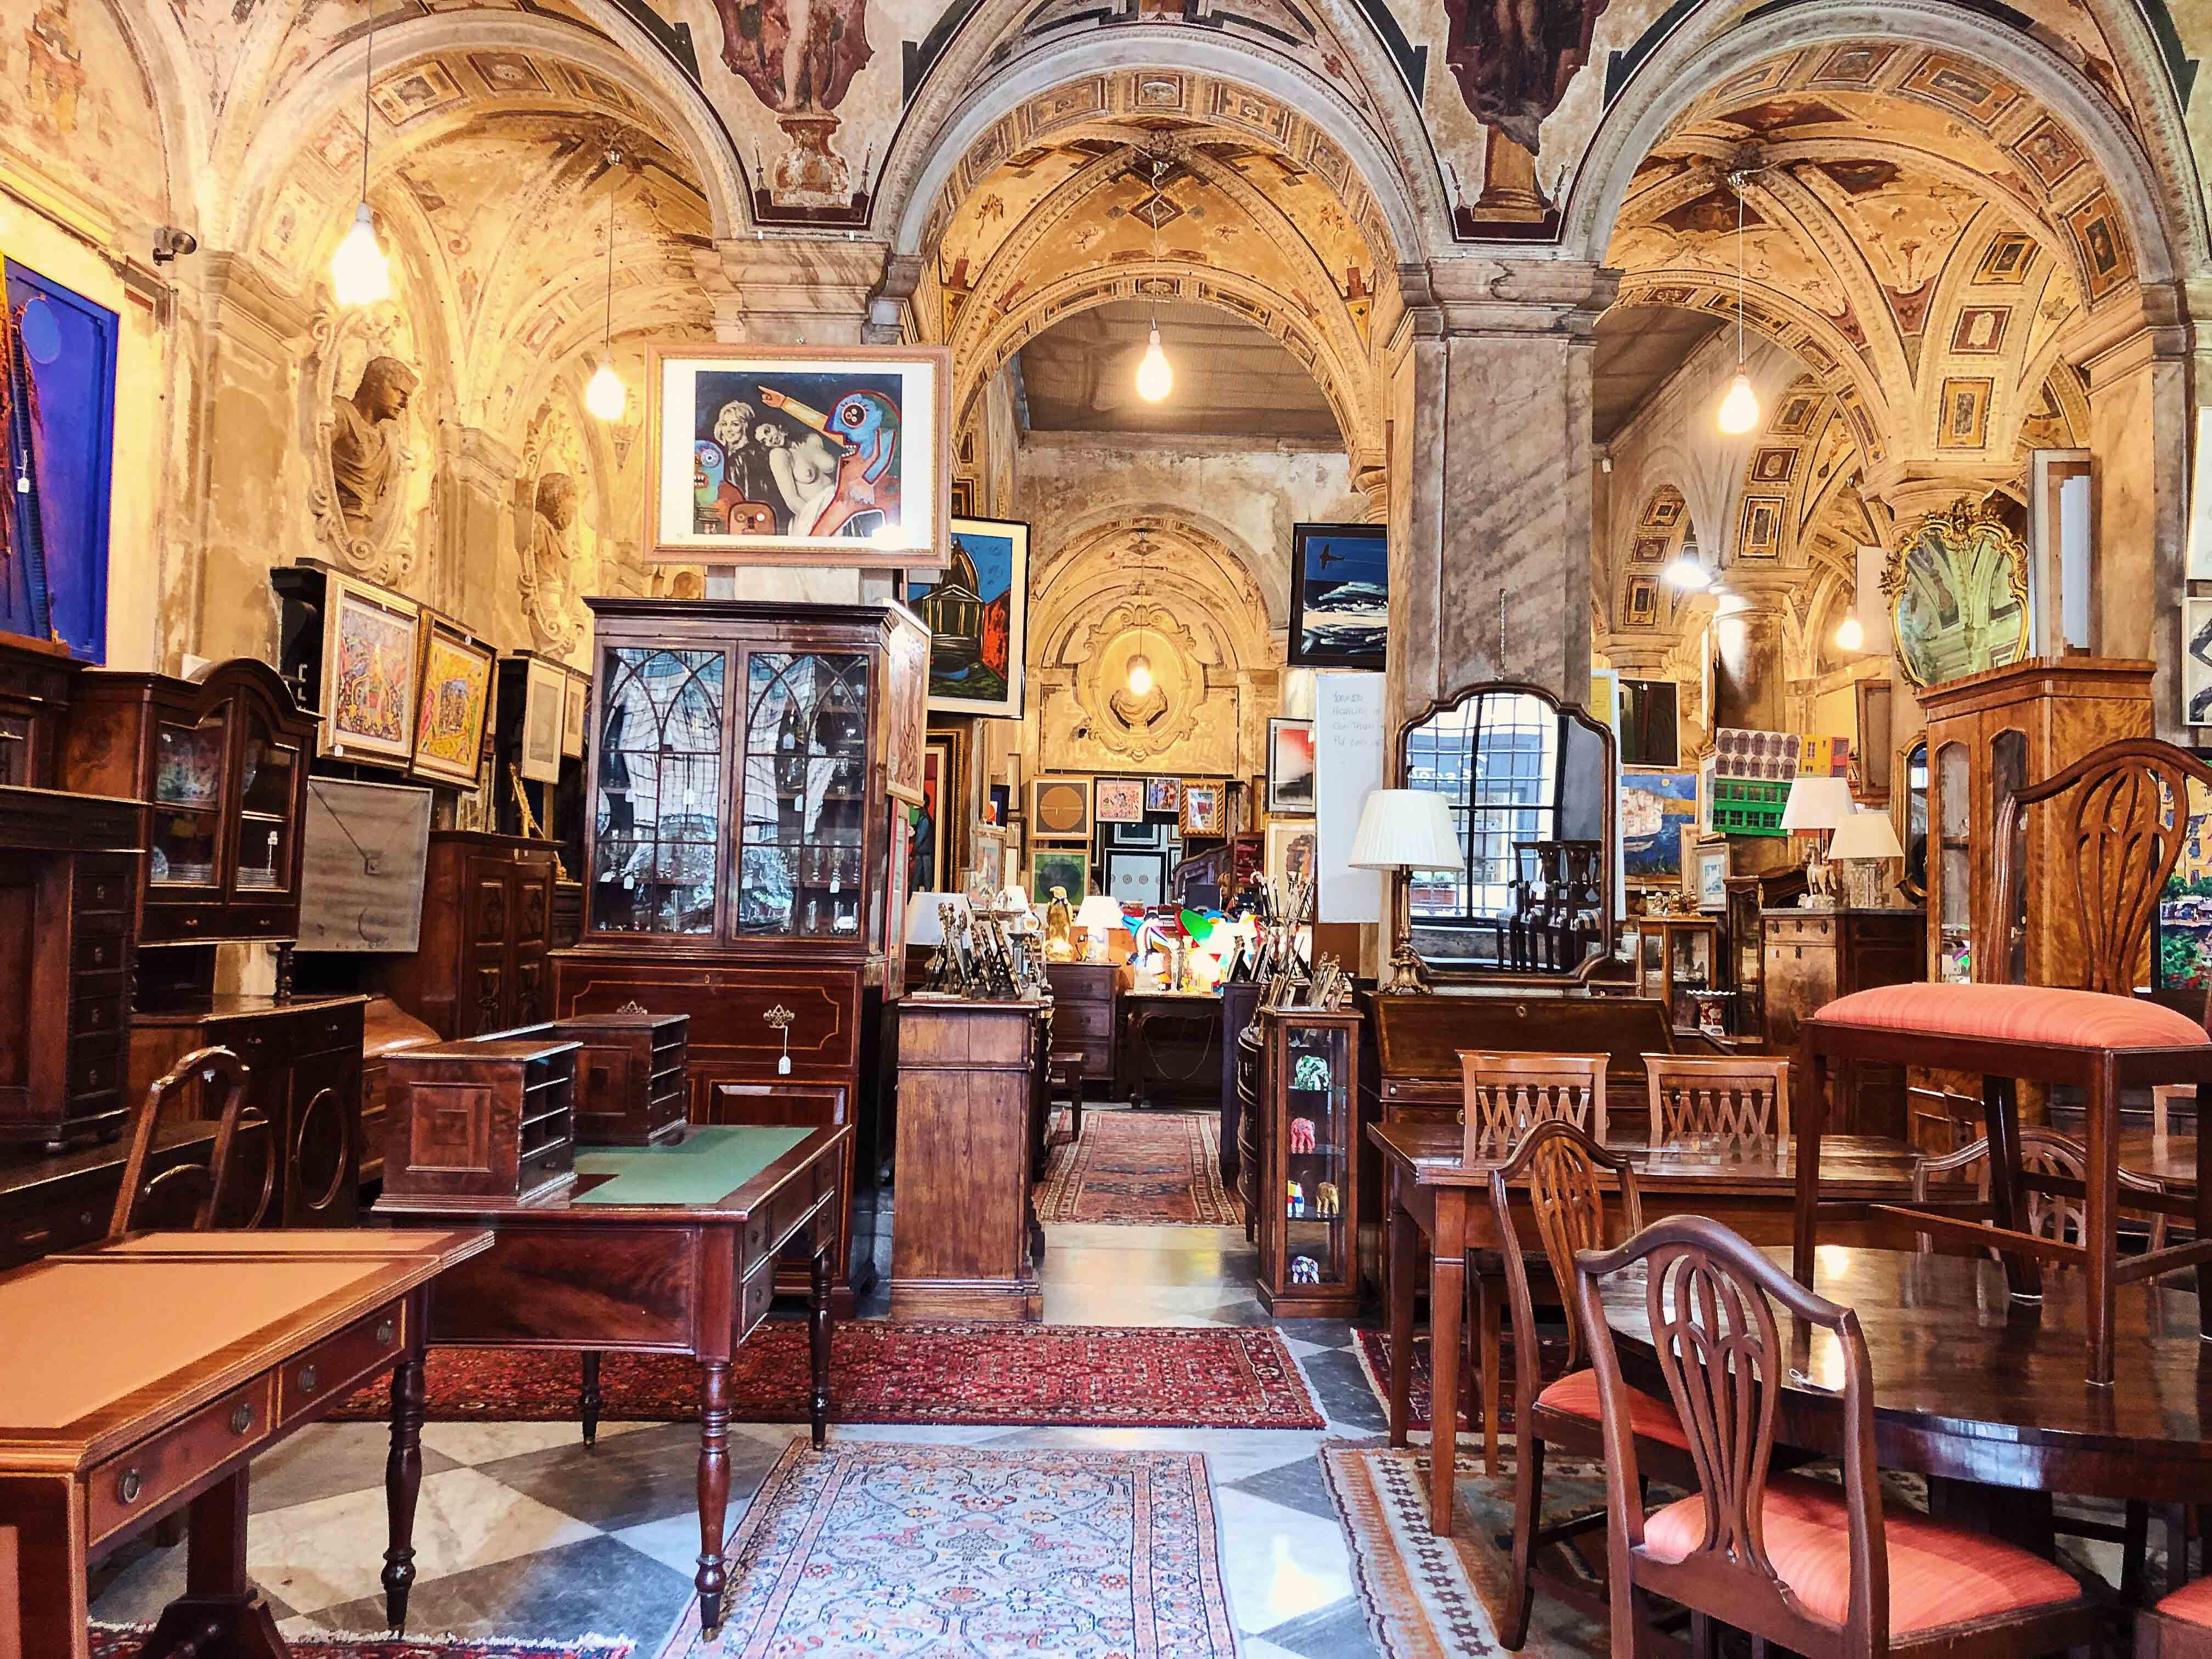 Антикварный магазин Galleria Imperiale и лавка тканей Giovanni Rivara fu Luigi.